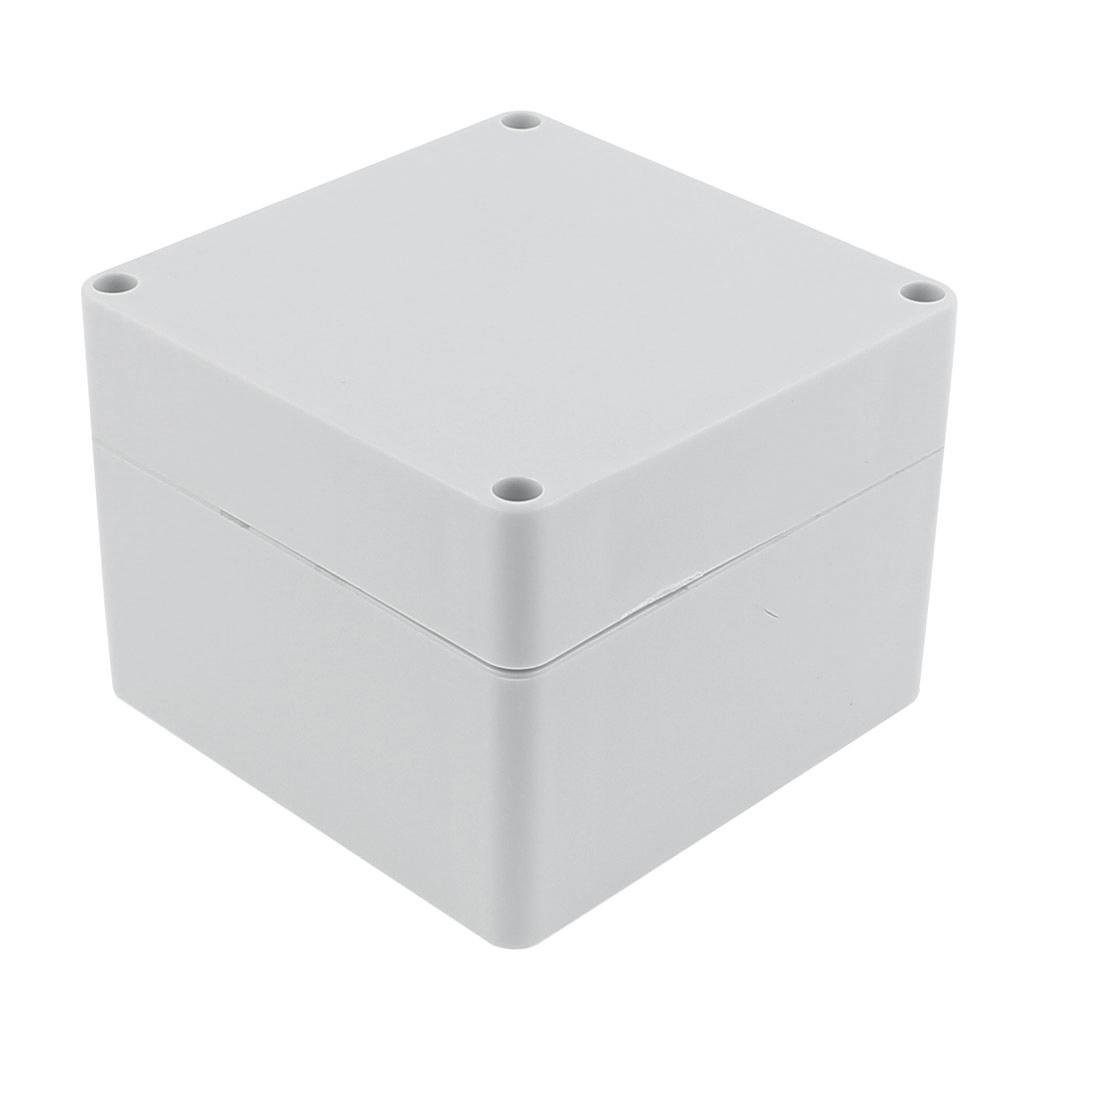 120 x 120 x 90mm Dustproof IP65 Junction Box Terminal Connecton Box Enclosure